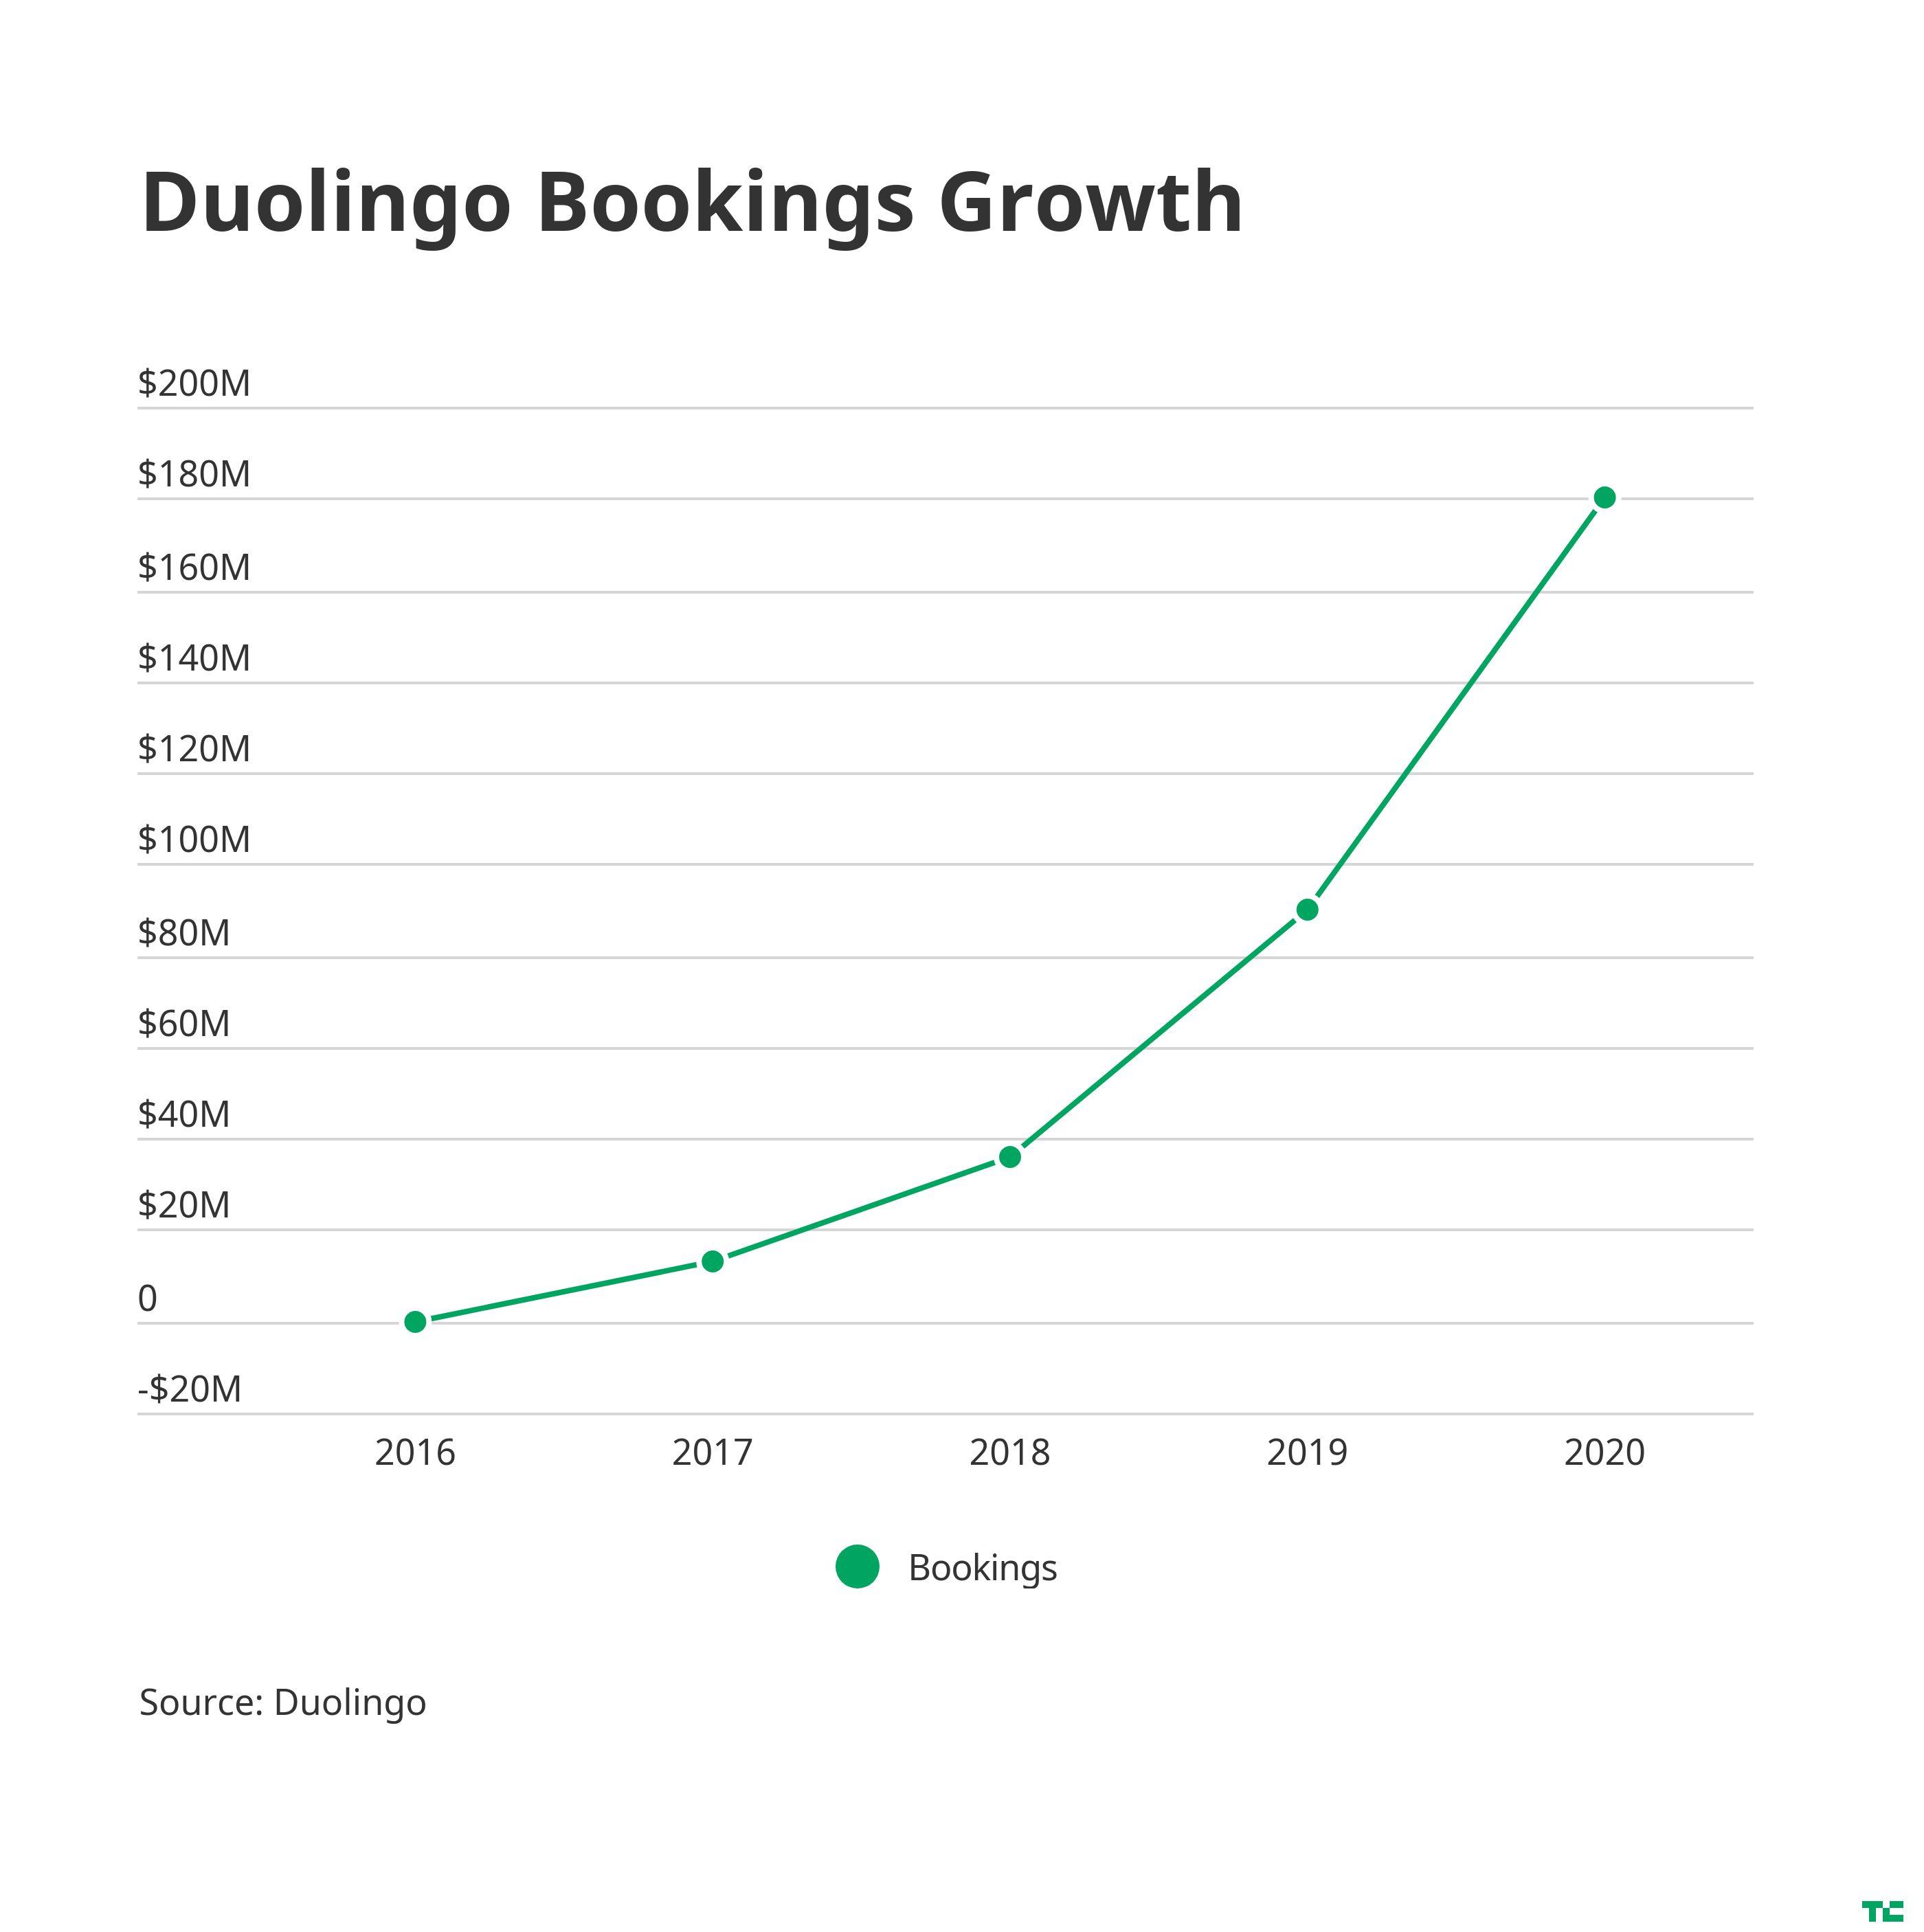 Duolingo CEO explains language app's surge in bookings